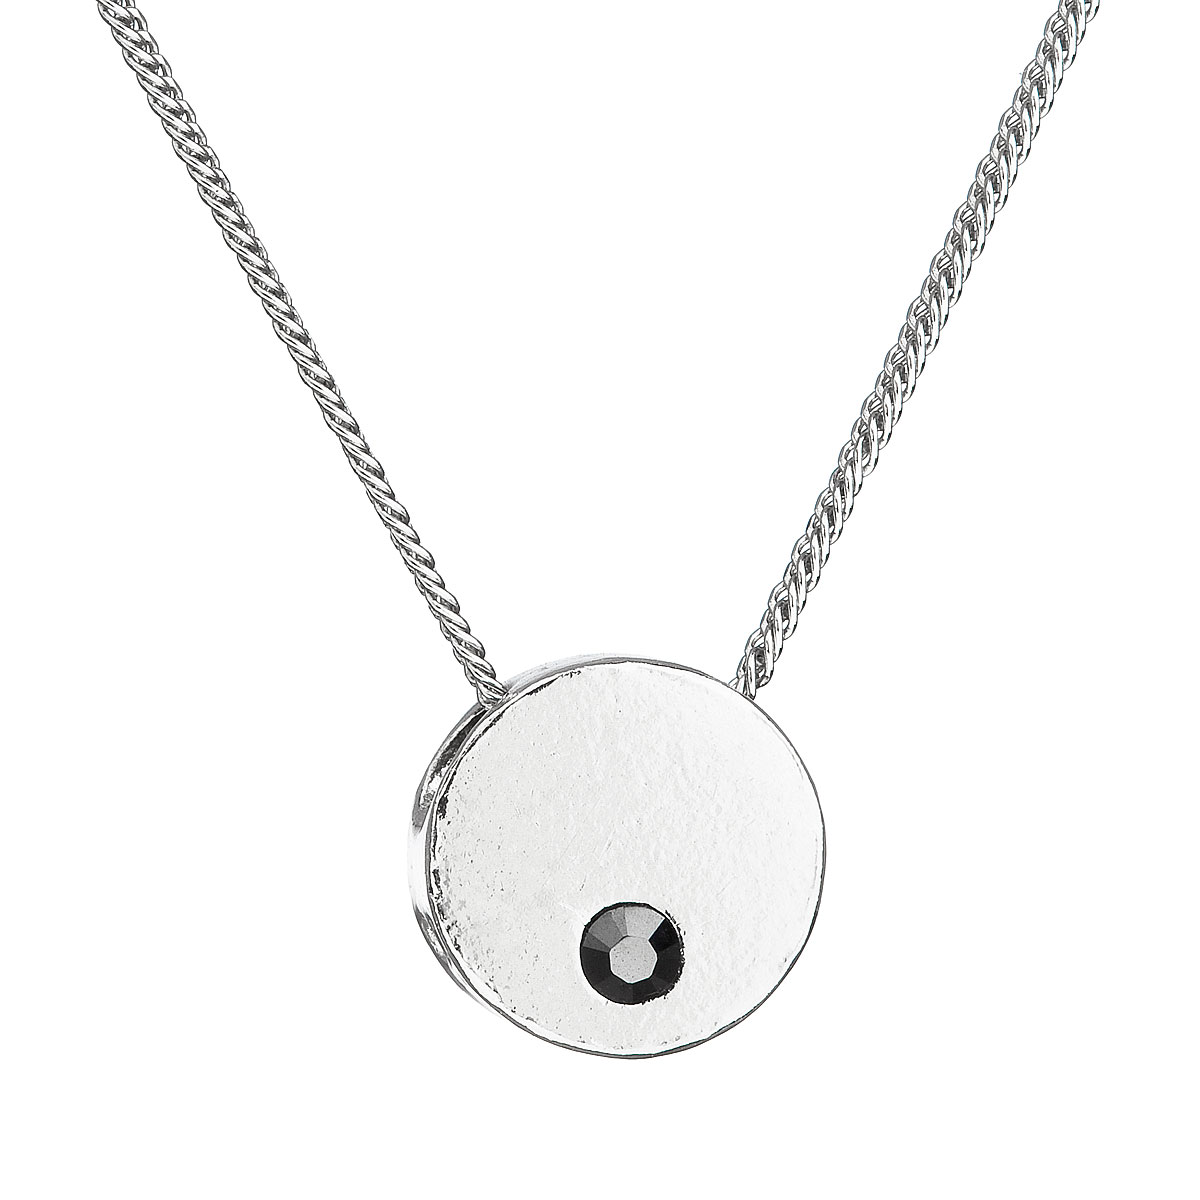 Evolution Group Stříbrný náhrdelník s krystaly Swarovski černý 32053.5